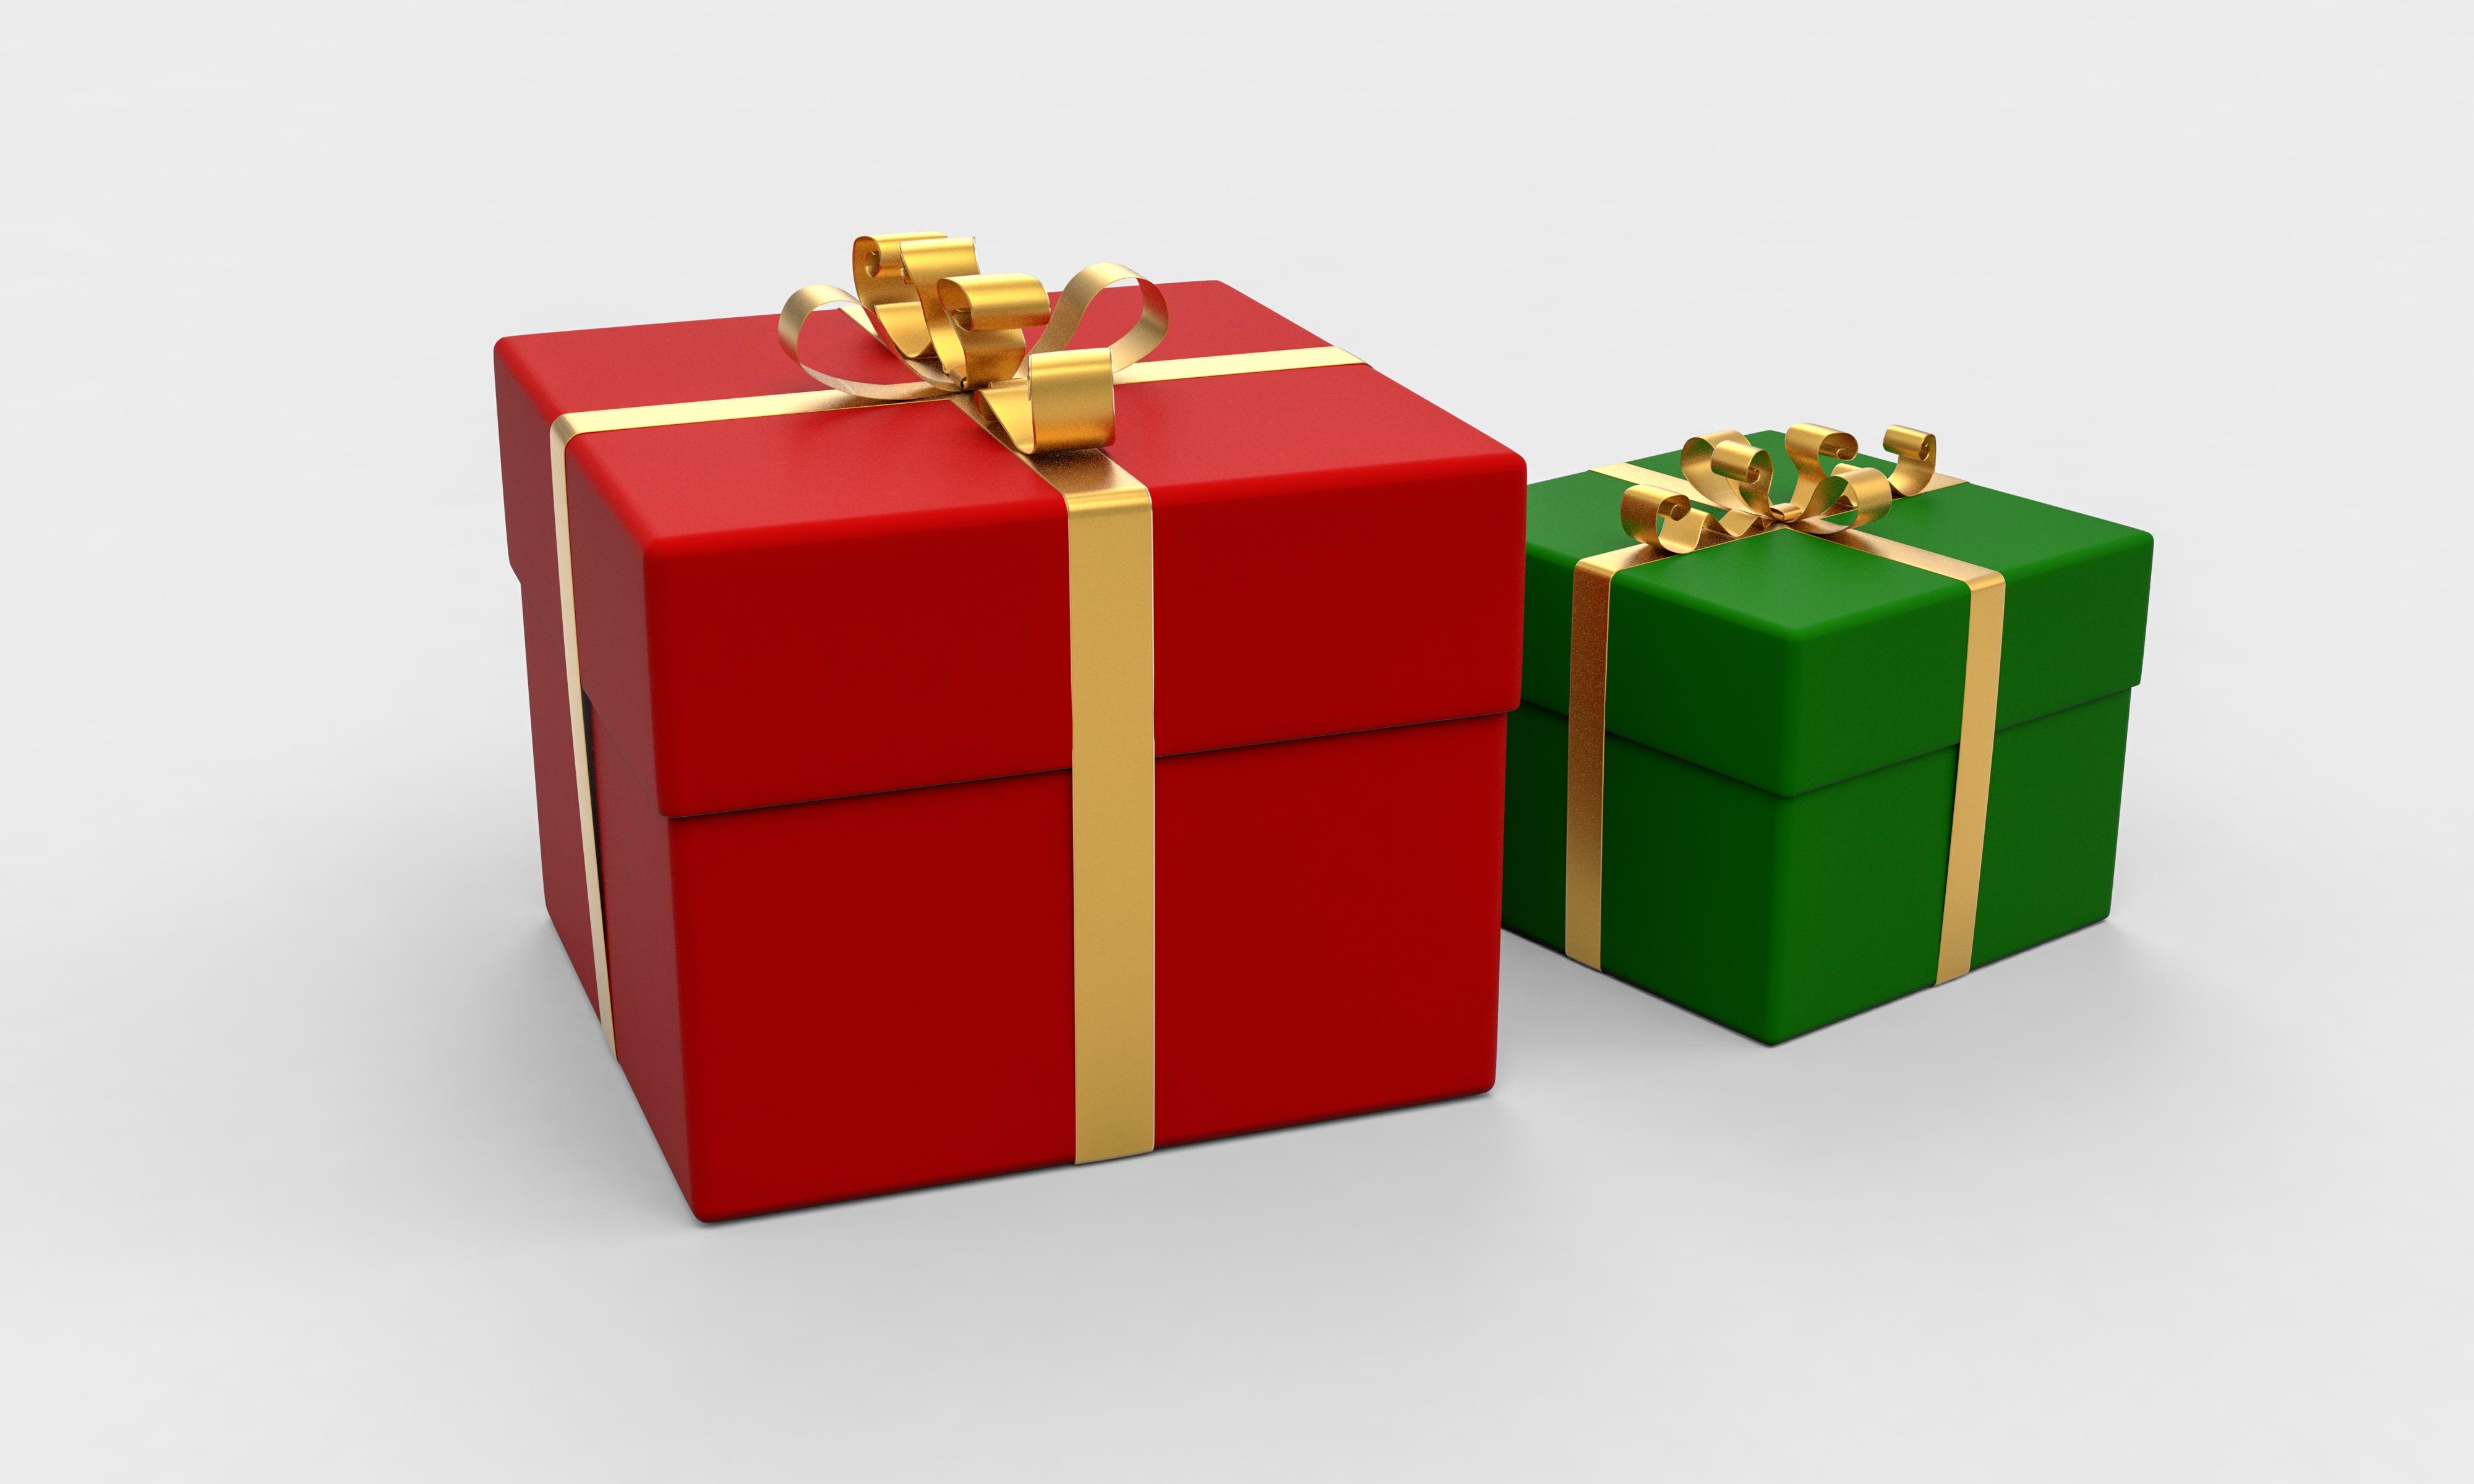 Free Images : celebration, waiting, gift, decoration, green, golden, red, symbol, square ...